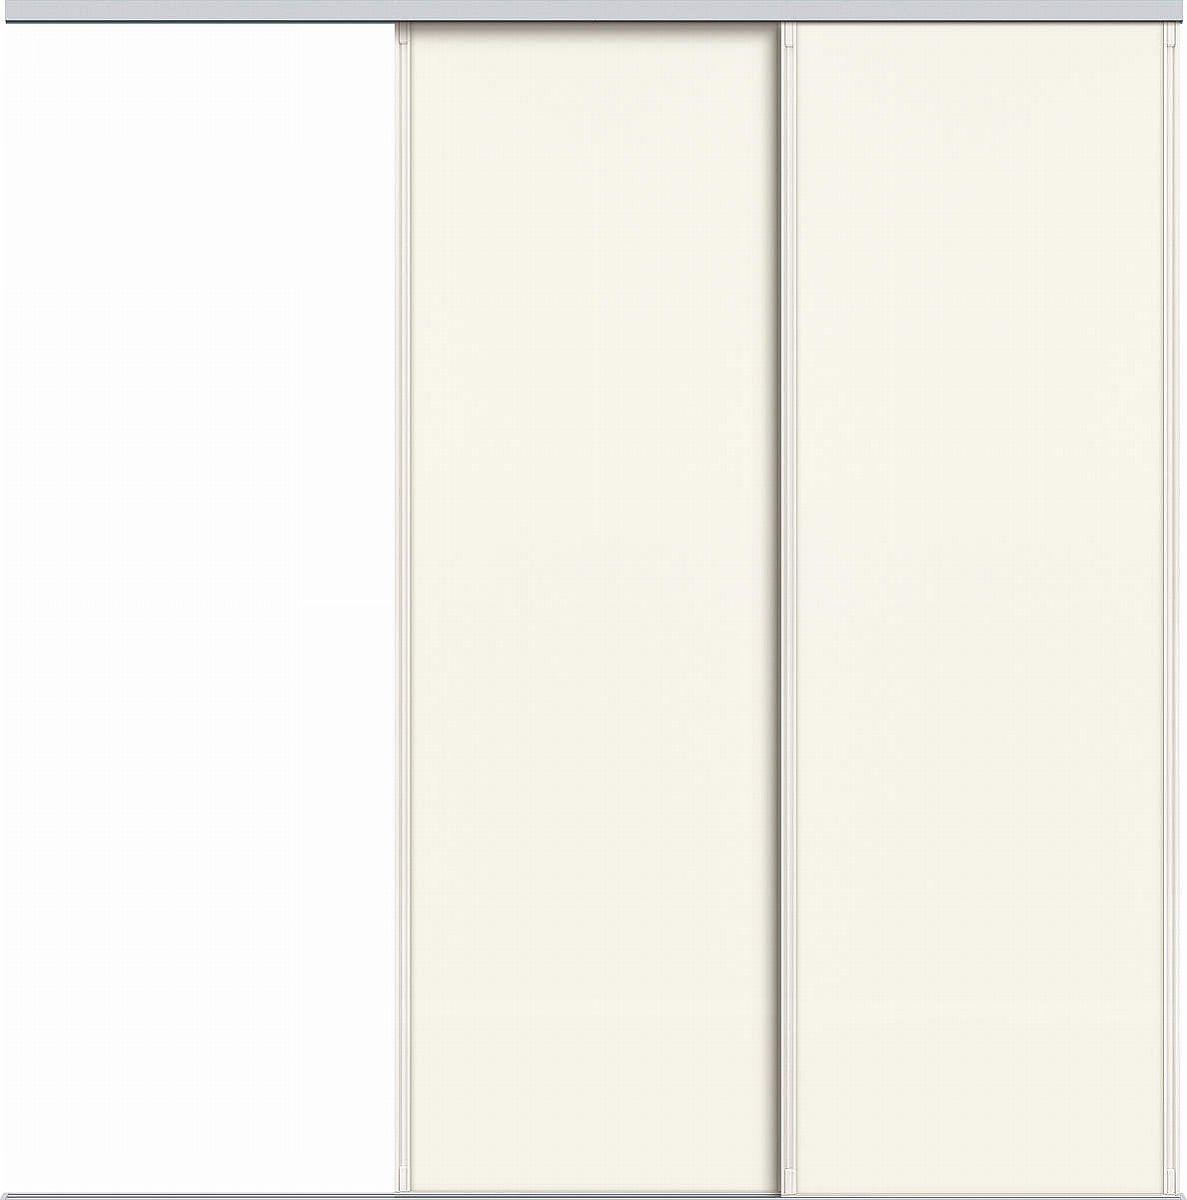 YKKAPアルミインテリア スクリーンパーティション[間仕切] 片引き戸2枚建(アルミ枠) P8タイプ:[幅1740~2604mm×高2143~2442mm]【YKK】【室内インテリア】【サッシ】【片引戸】【室内引き戸】【パーテーション】【パーテイション】【アルミ建具】【バリアフリー】